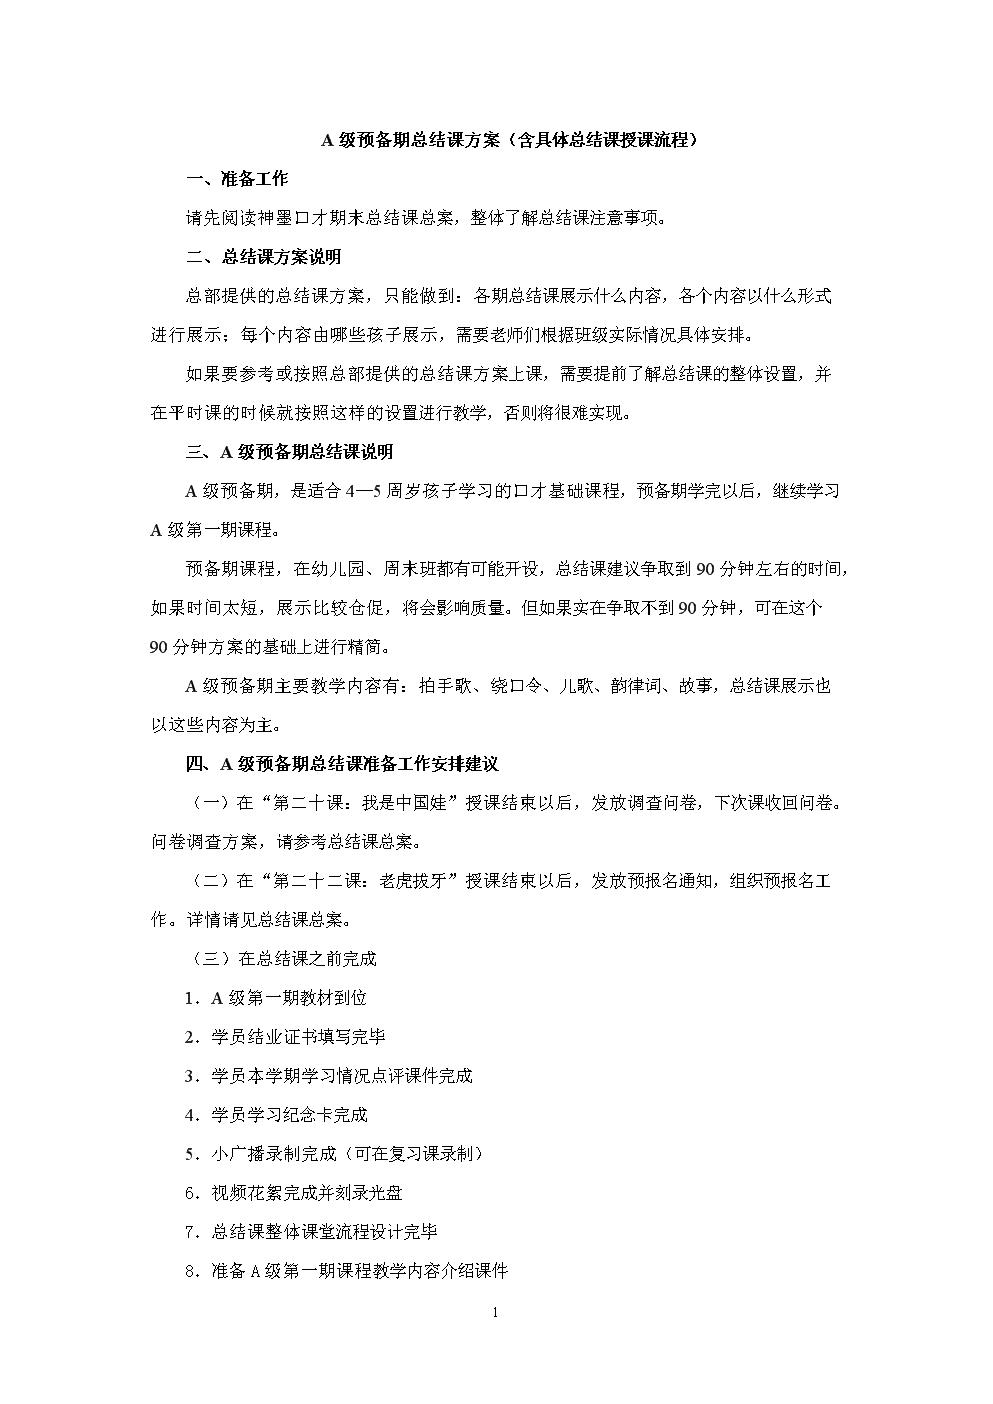 A级预备期总结课方案 V3.0.doc